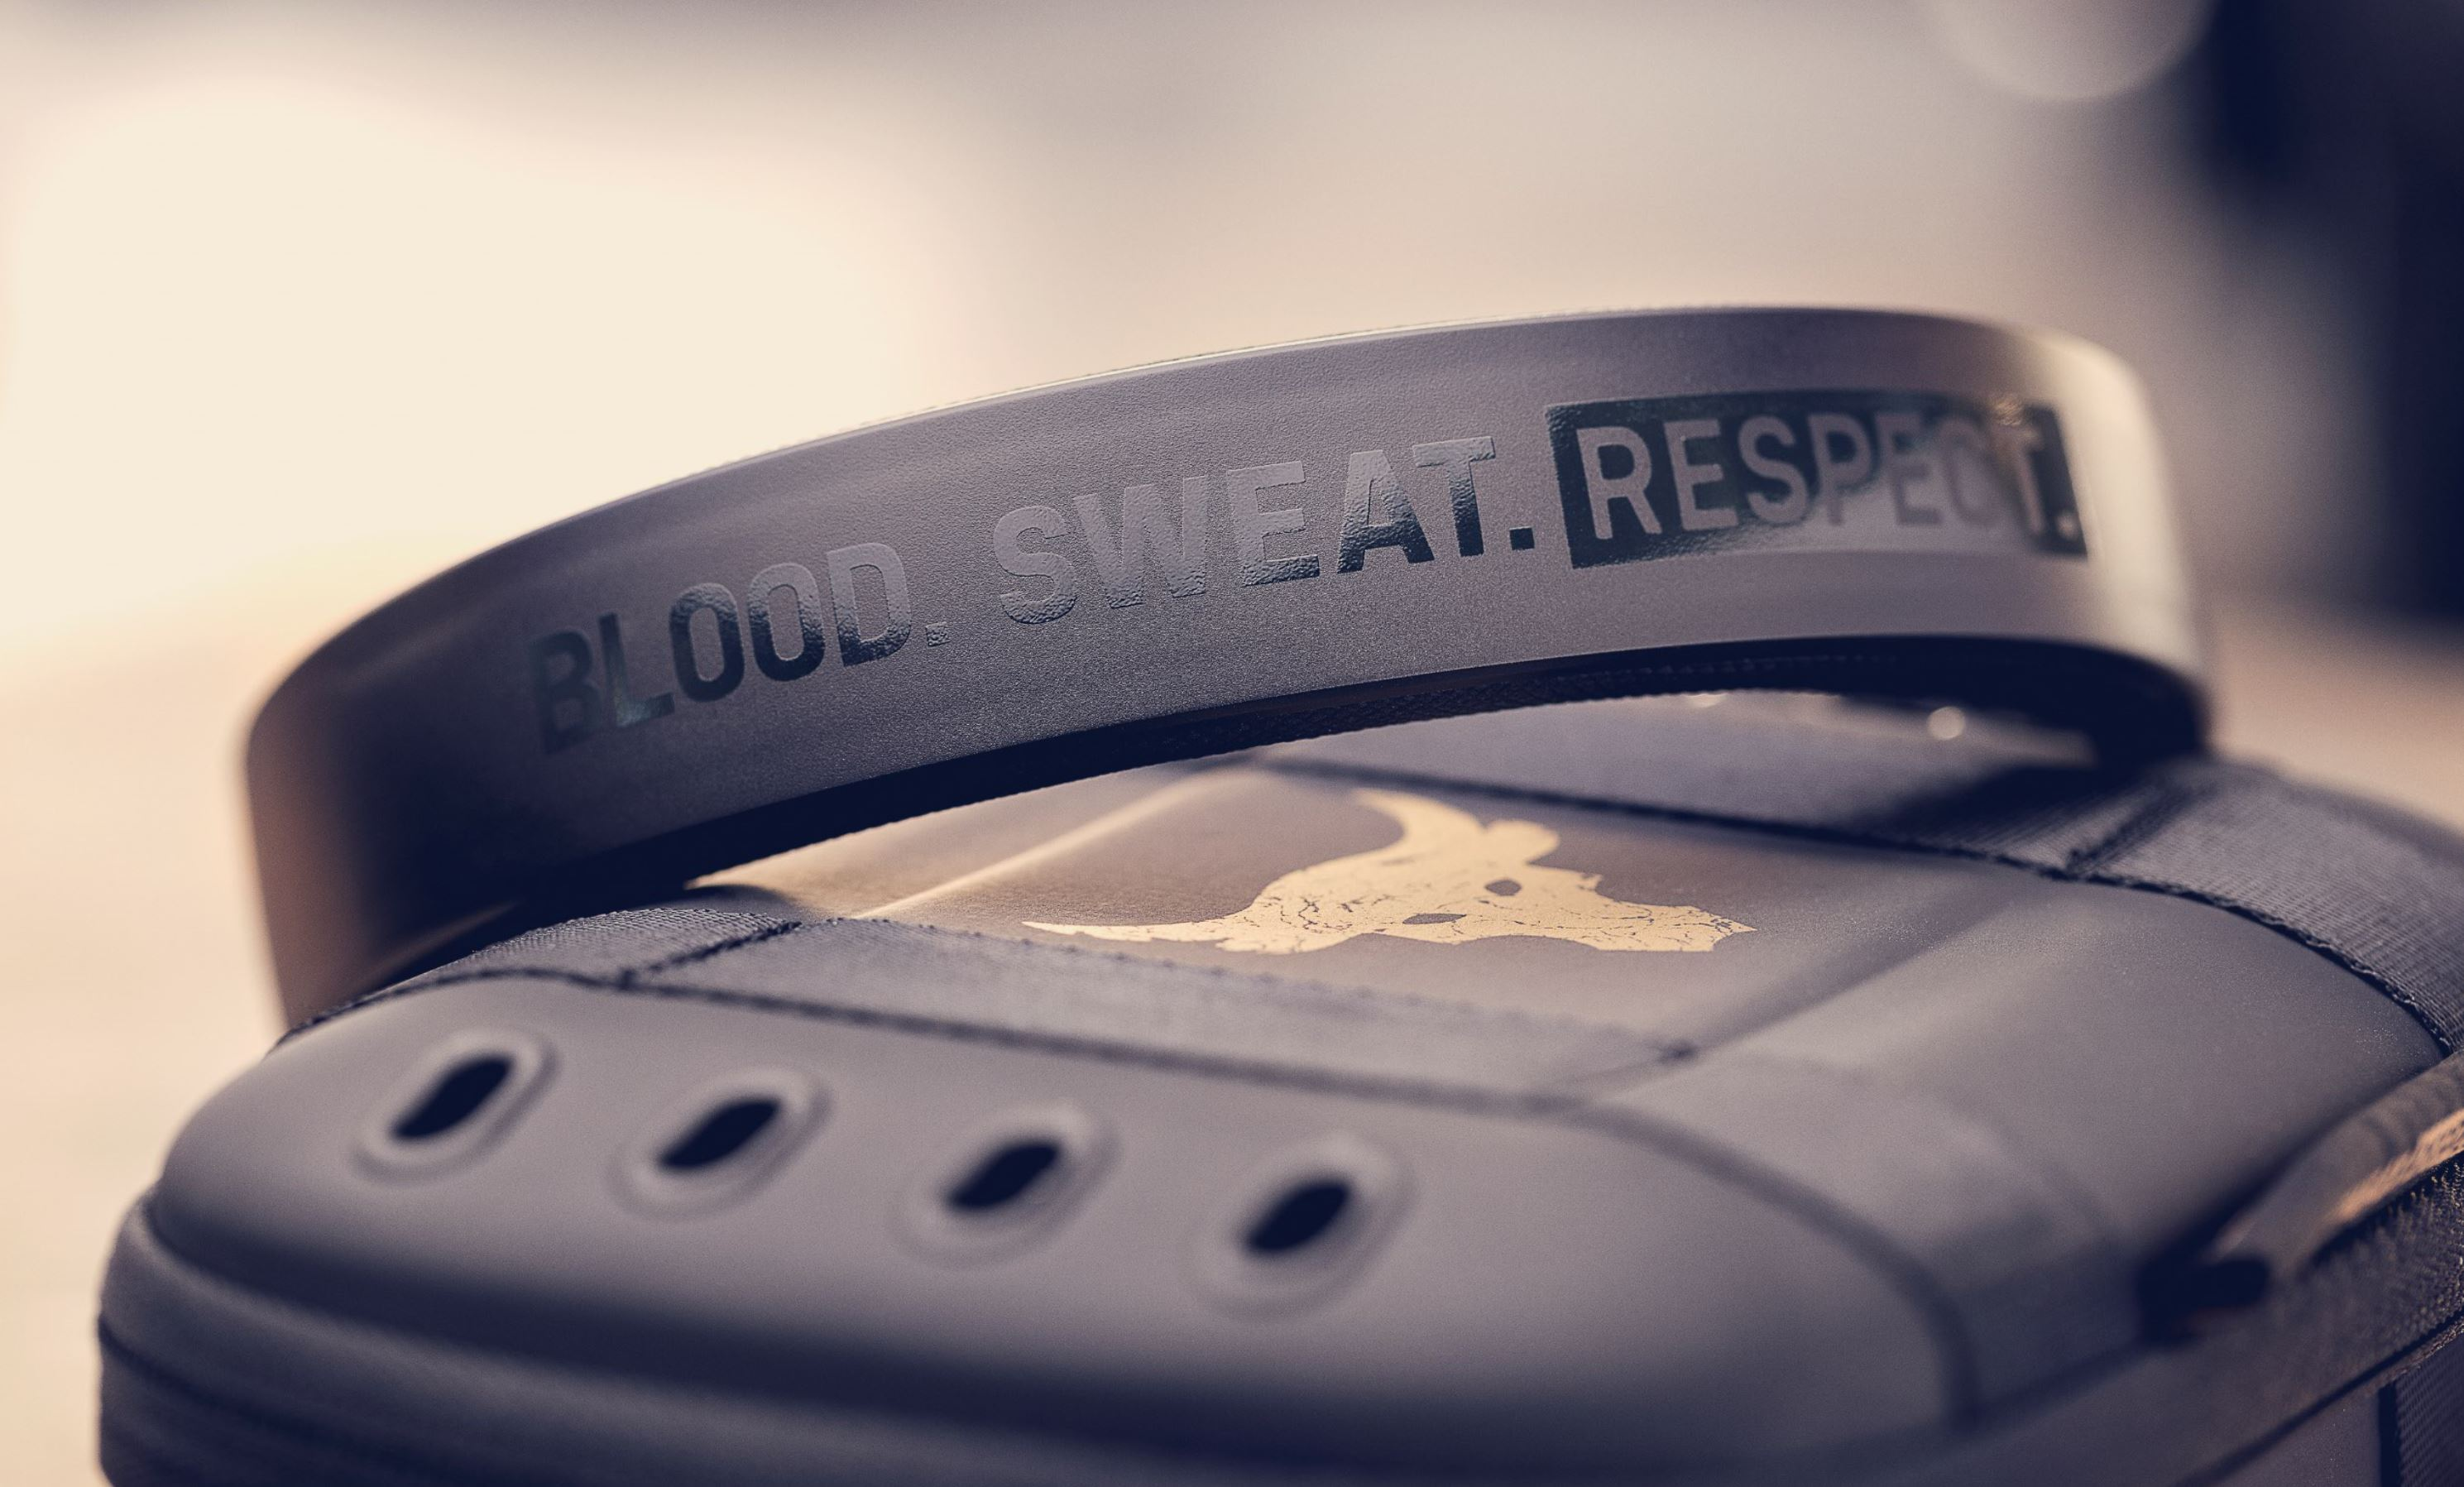 JBL UA Sport Wireless cuptrain Headphones project rock dwayne johnson 3